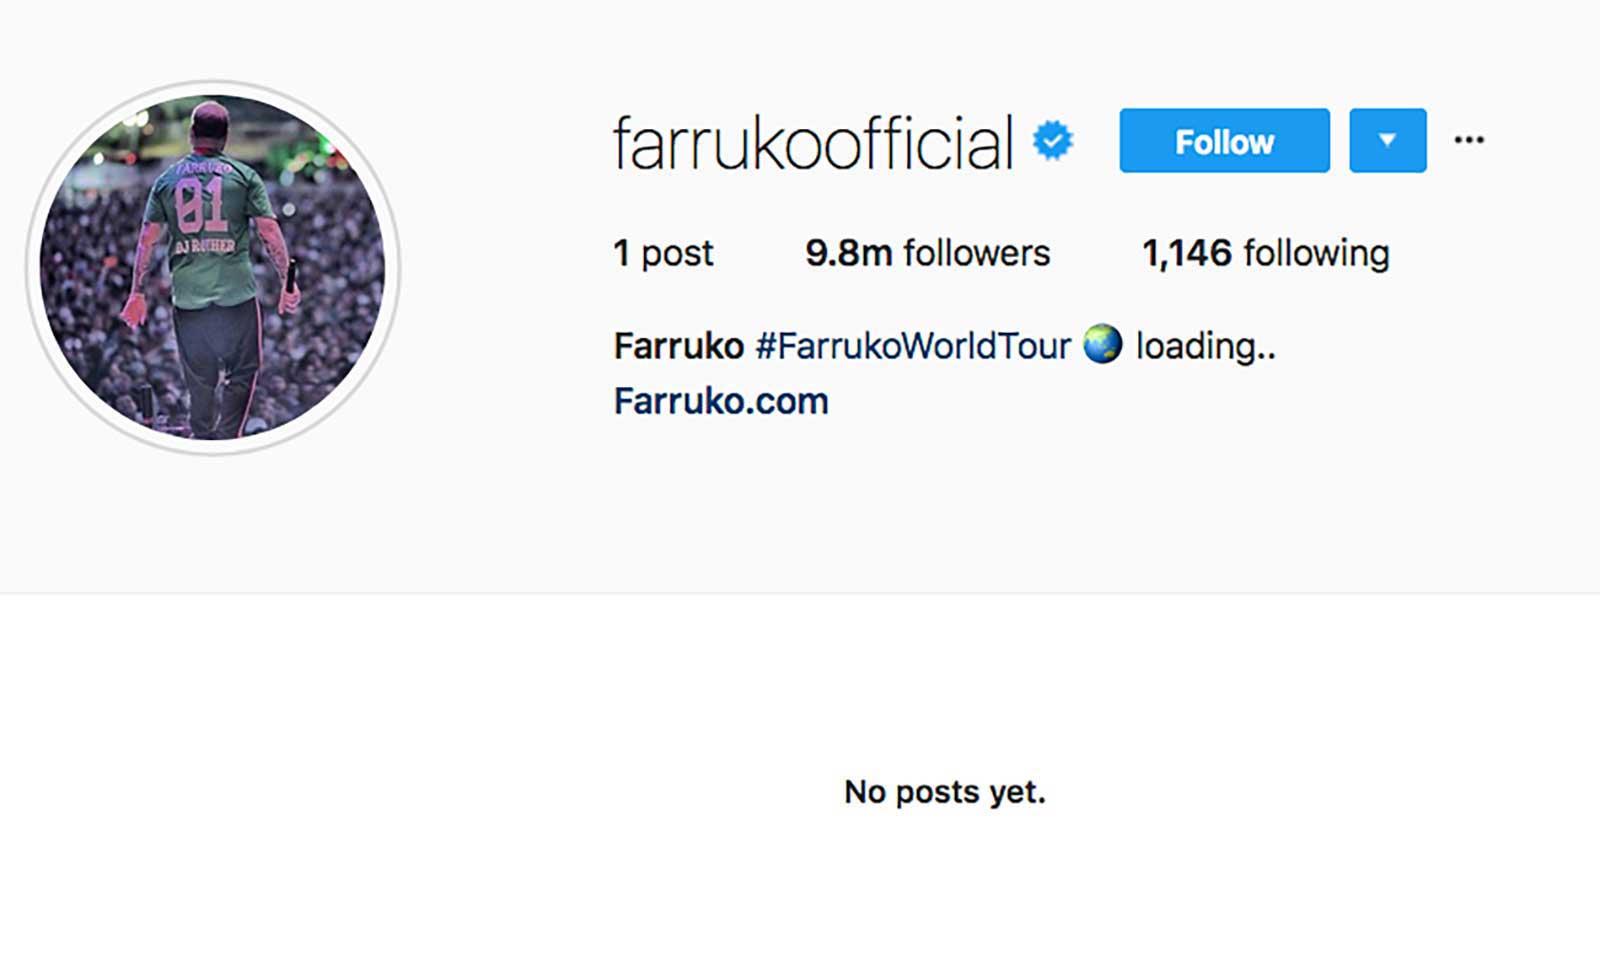 Cuenta de Instagram de Farruko